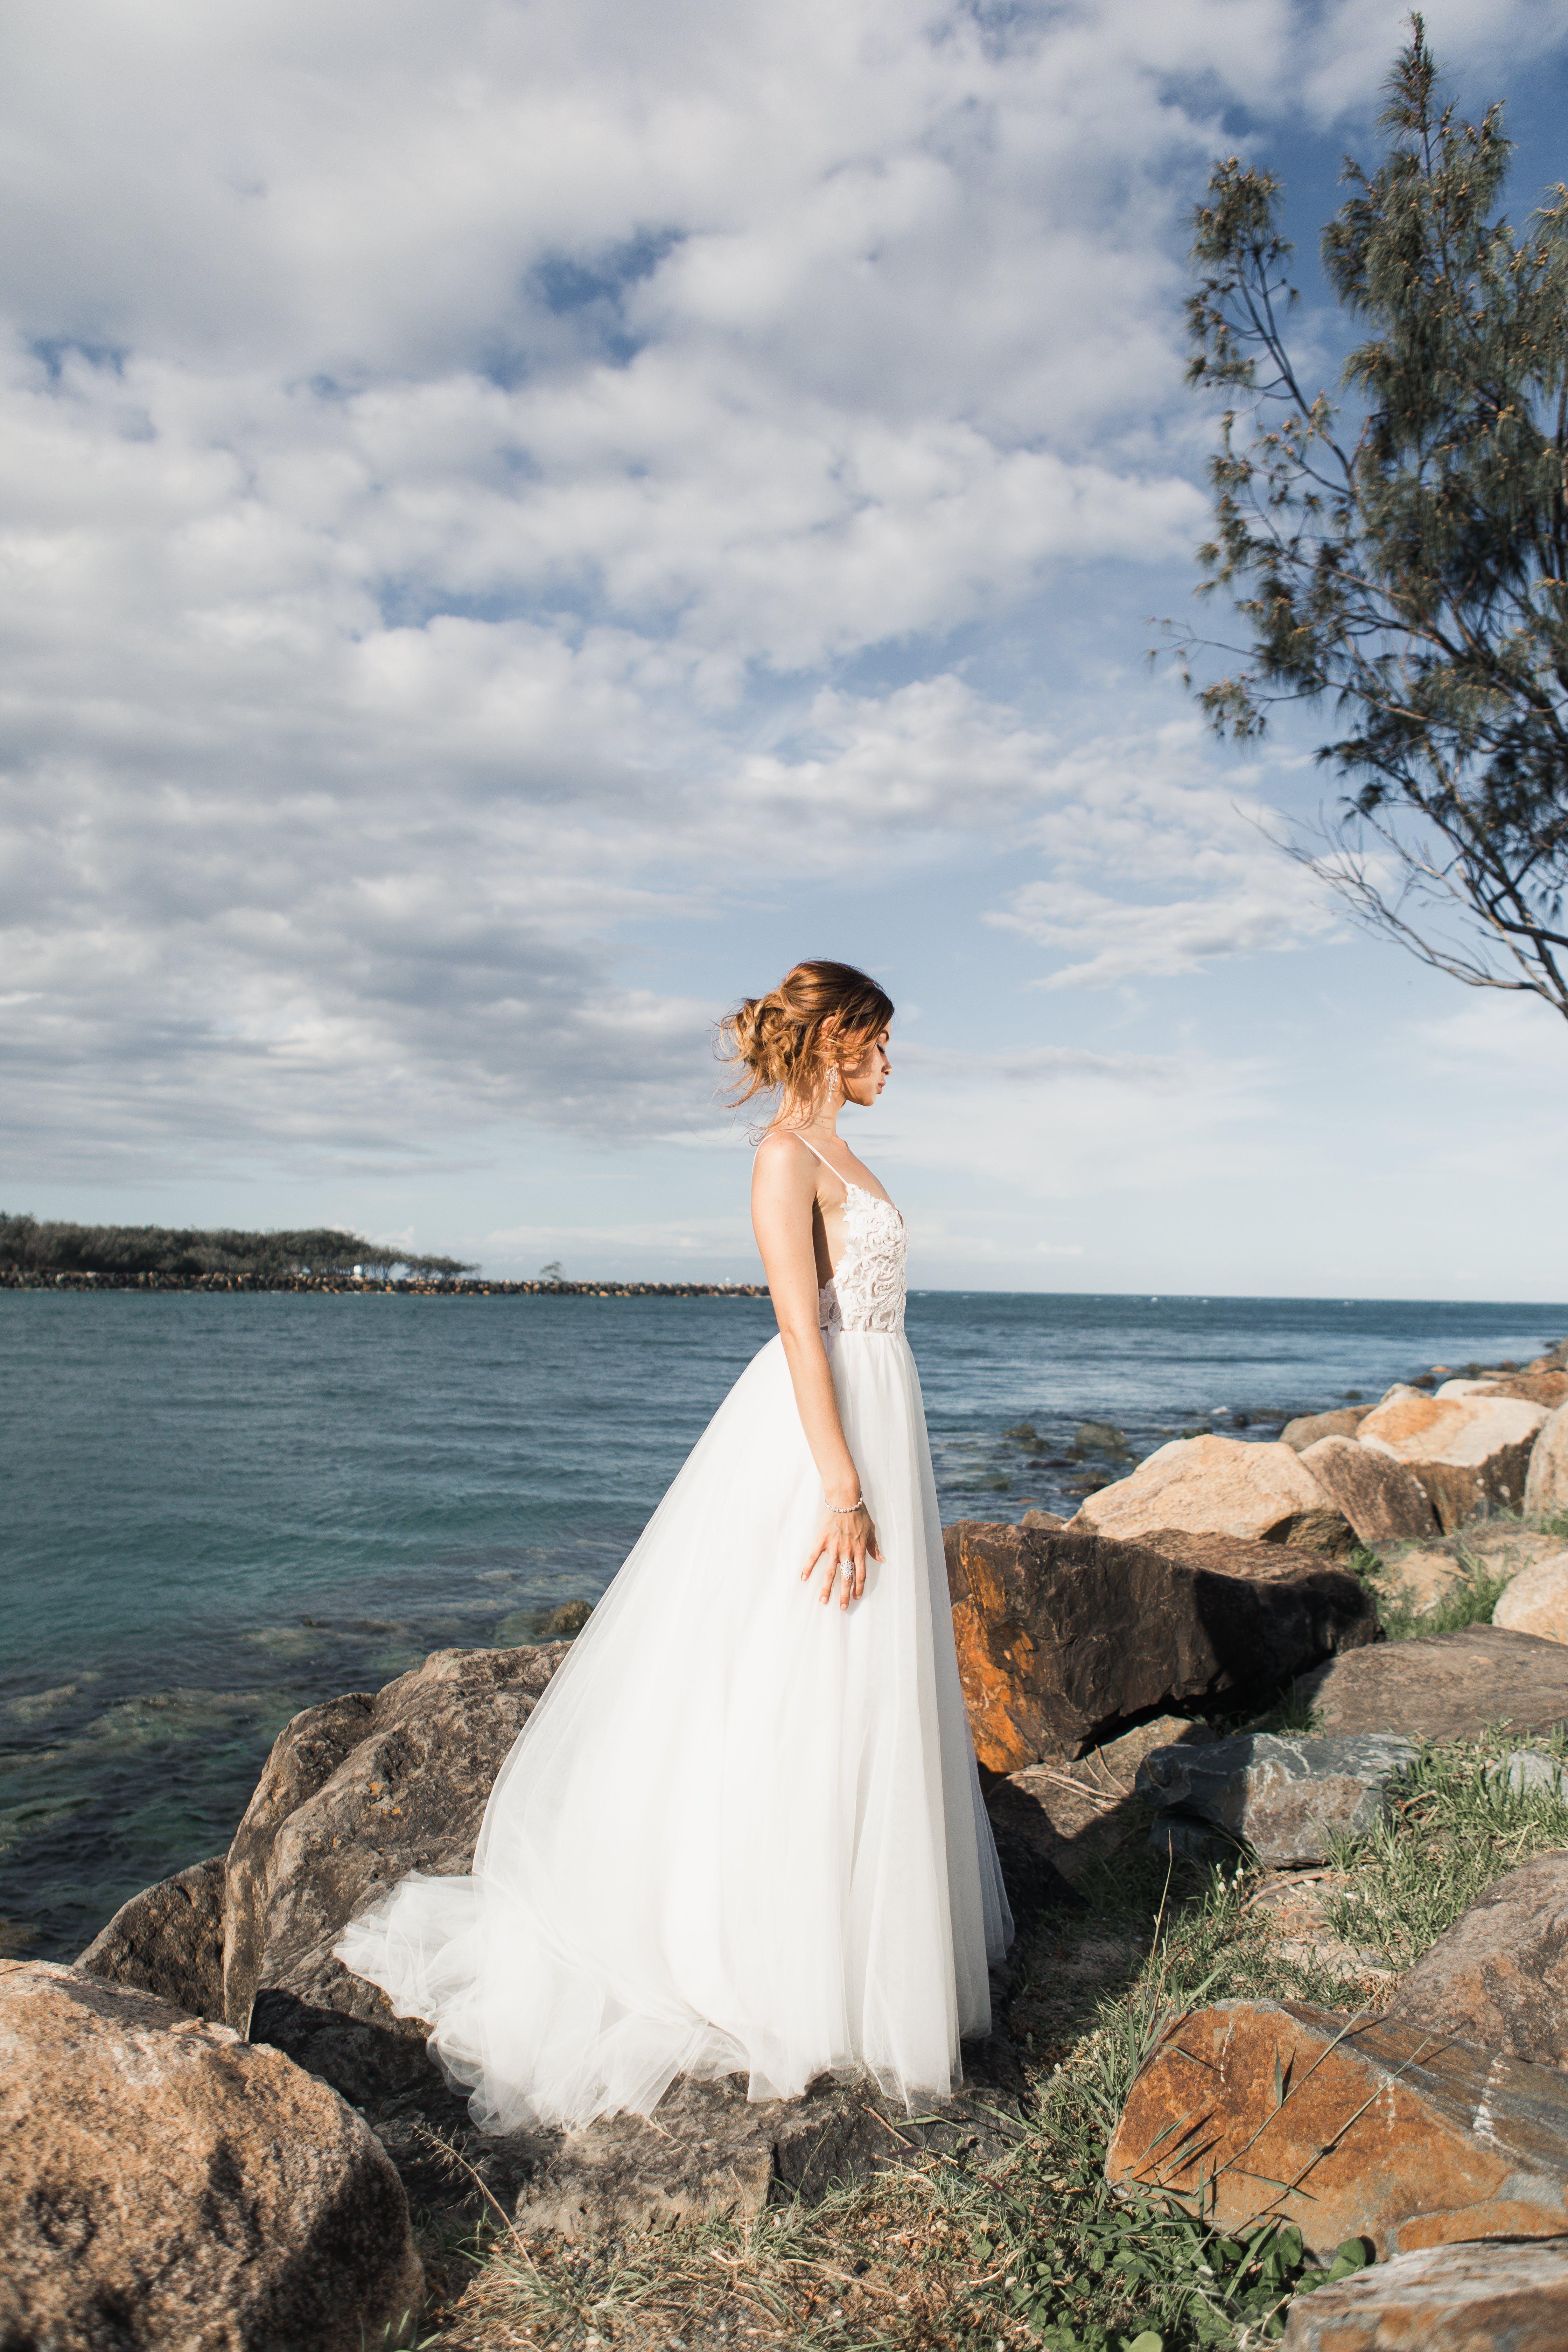 Fotos de stock gratuitas de Boda, mar, mujer, novia